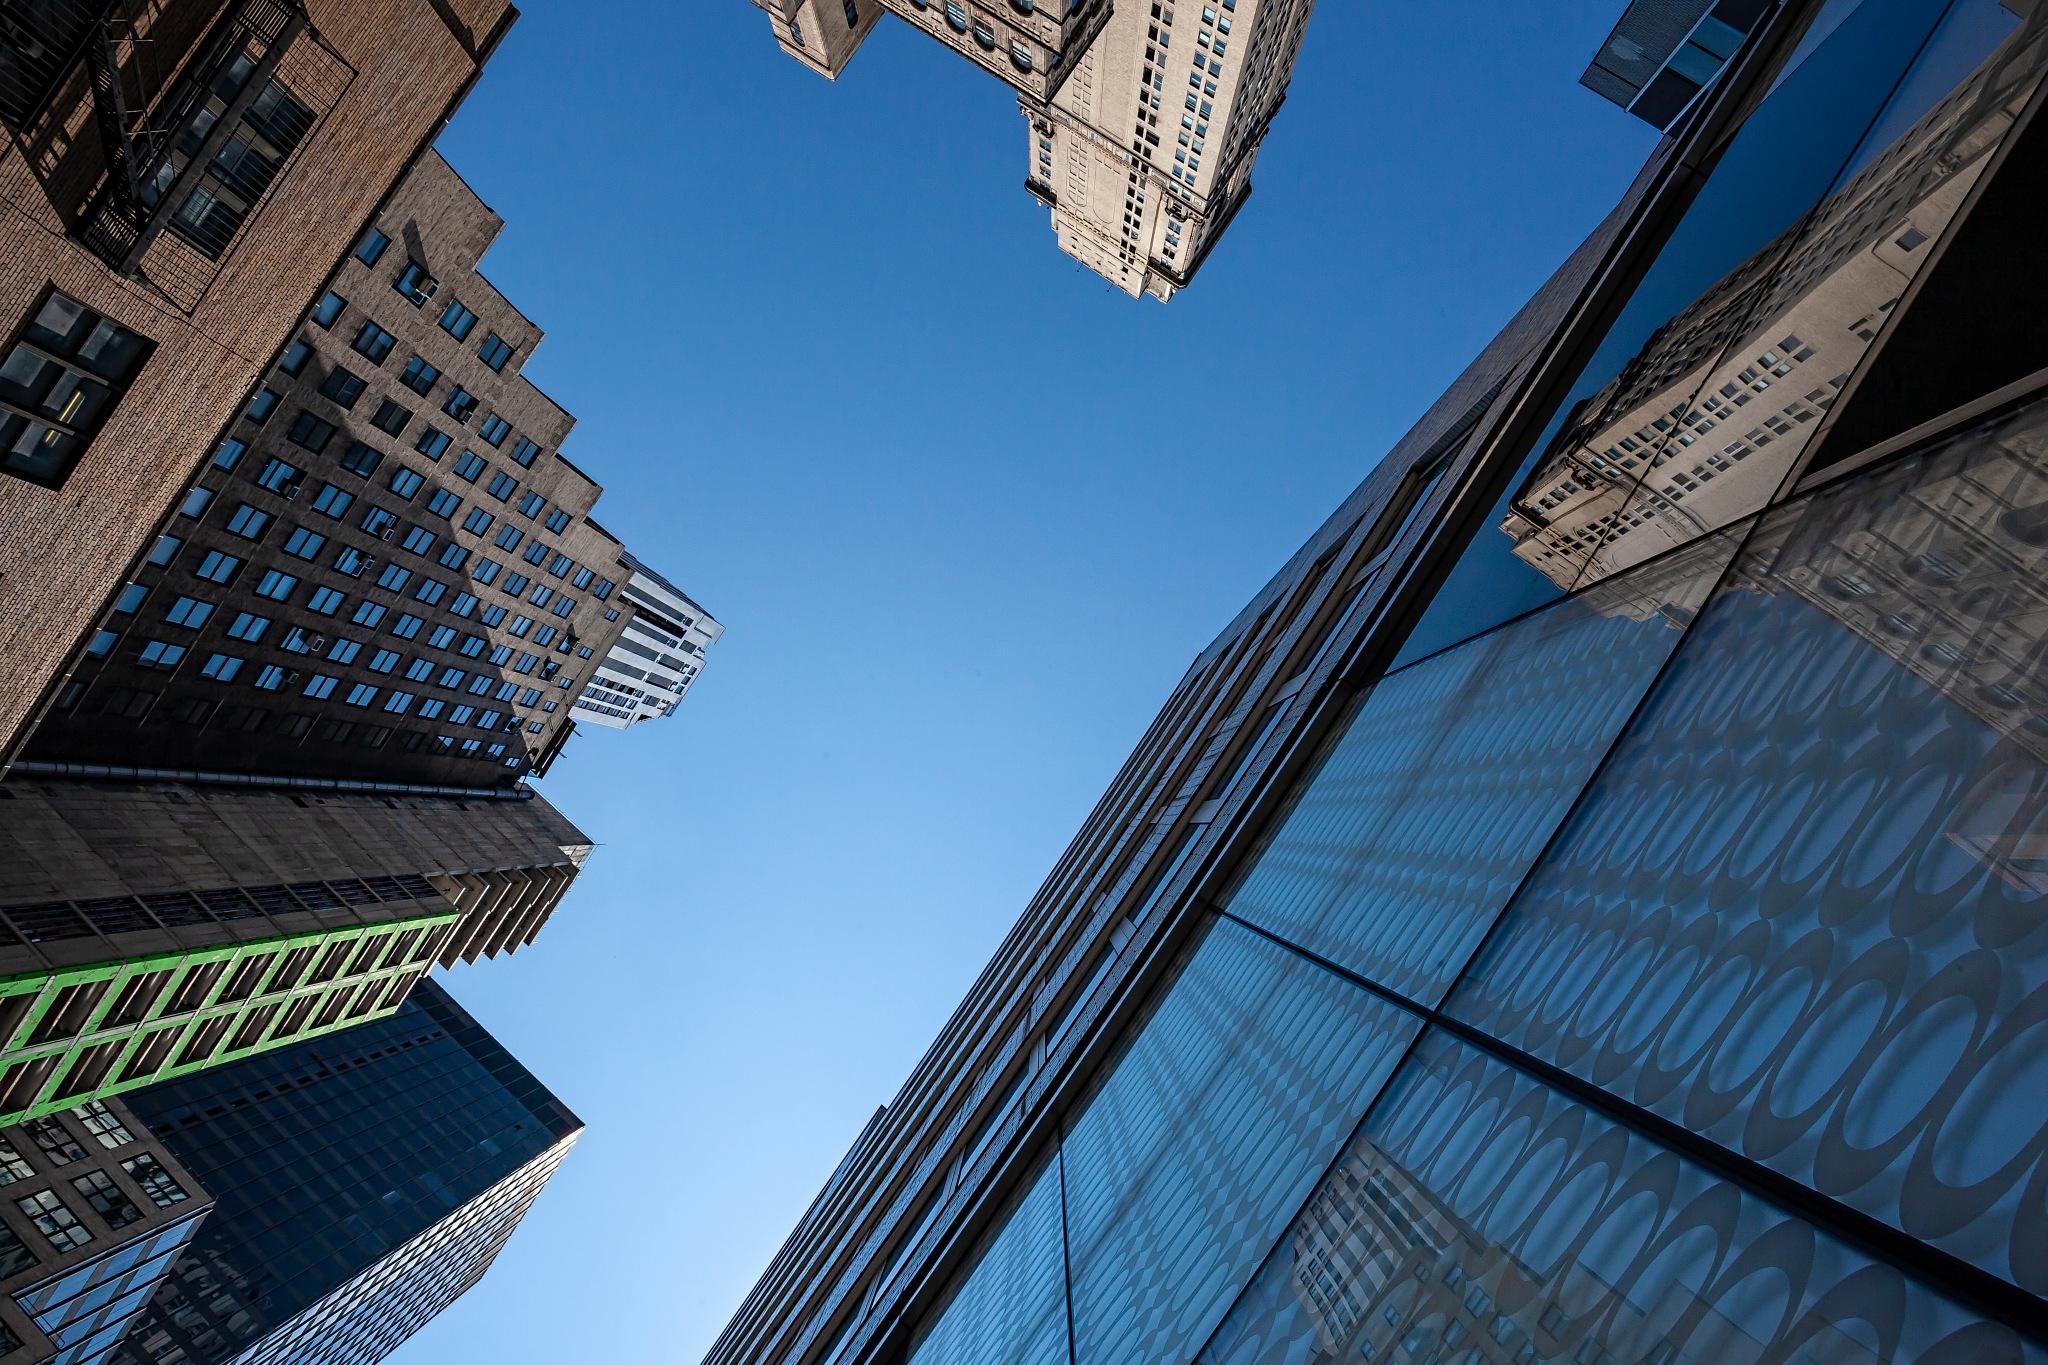 High Rise Office Buildings by robertullmann